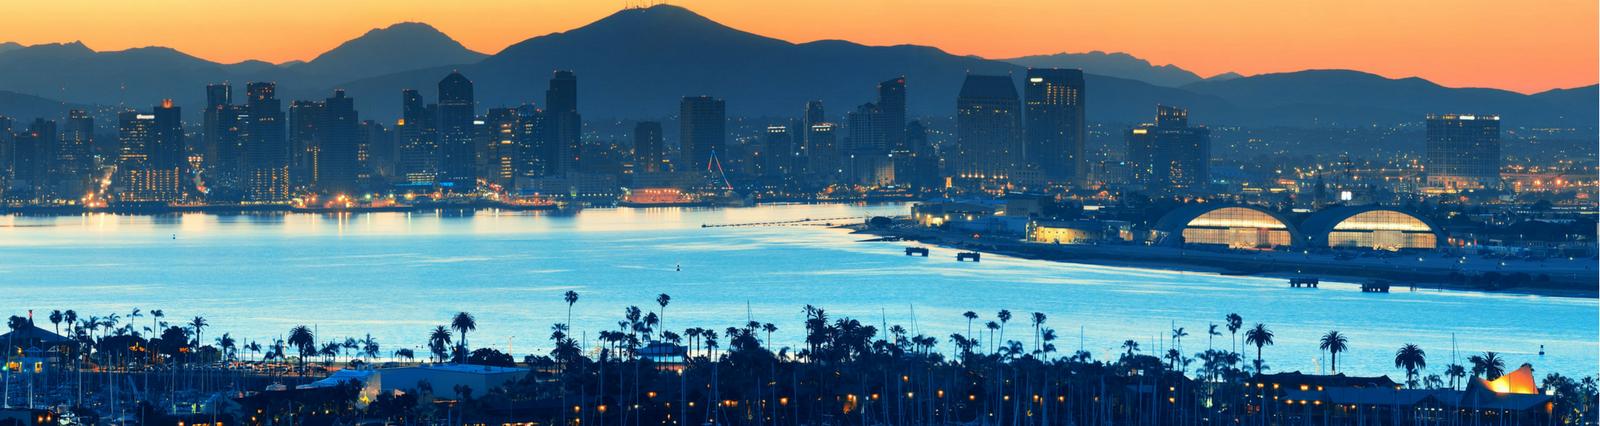 Image of San Diego 4Hilton Inc. Web Design & Development